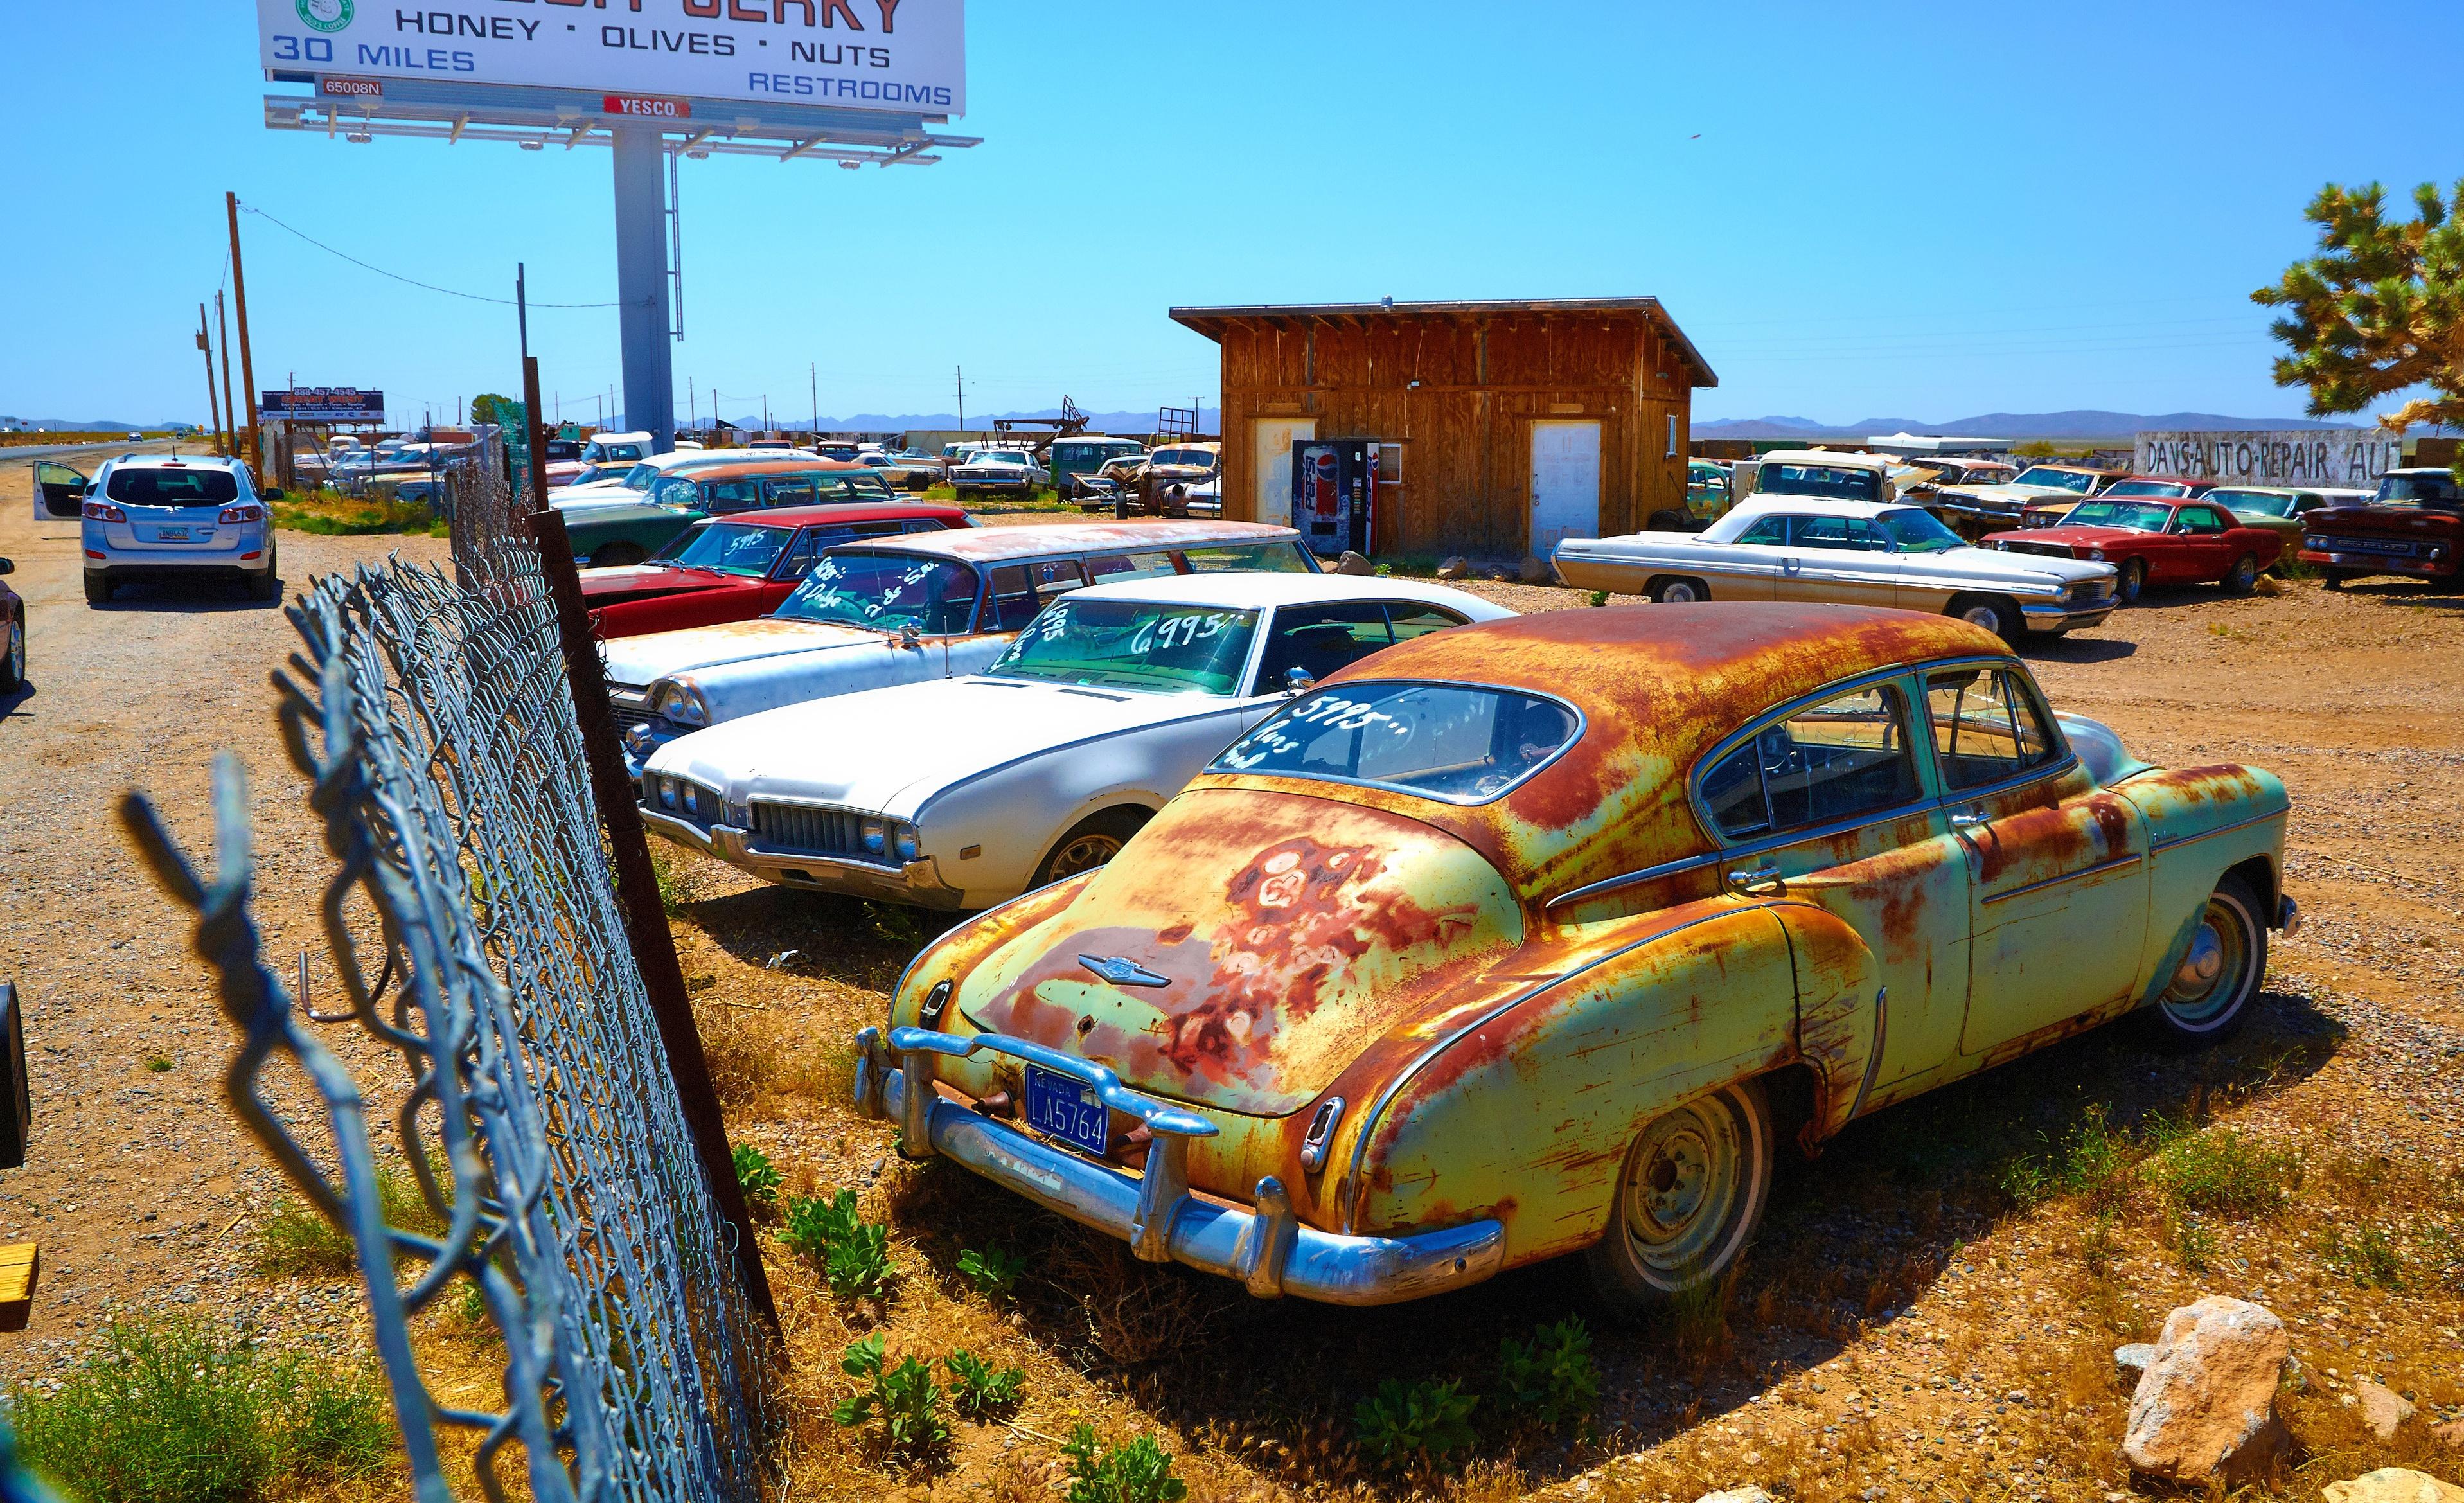 Arizona Used Car Sales Tax Calculator